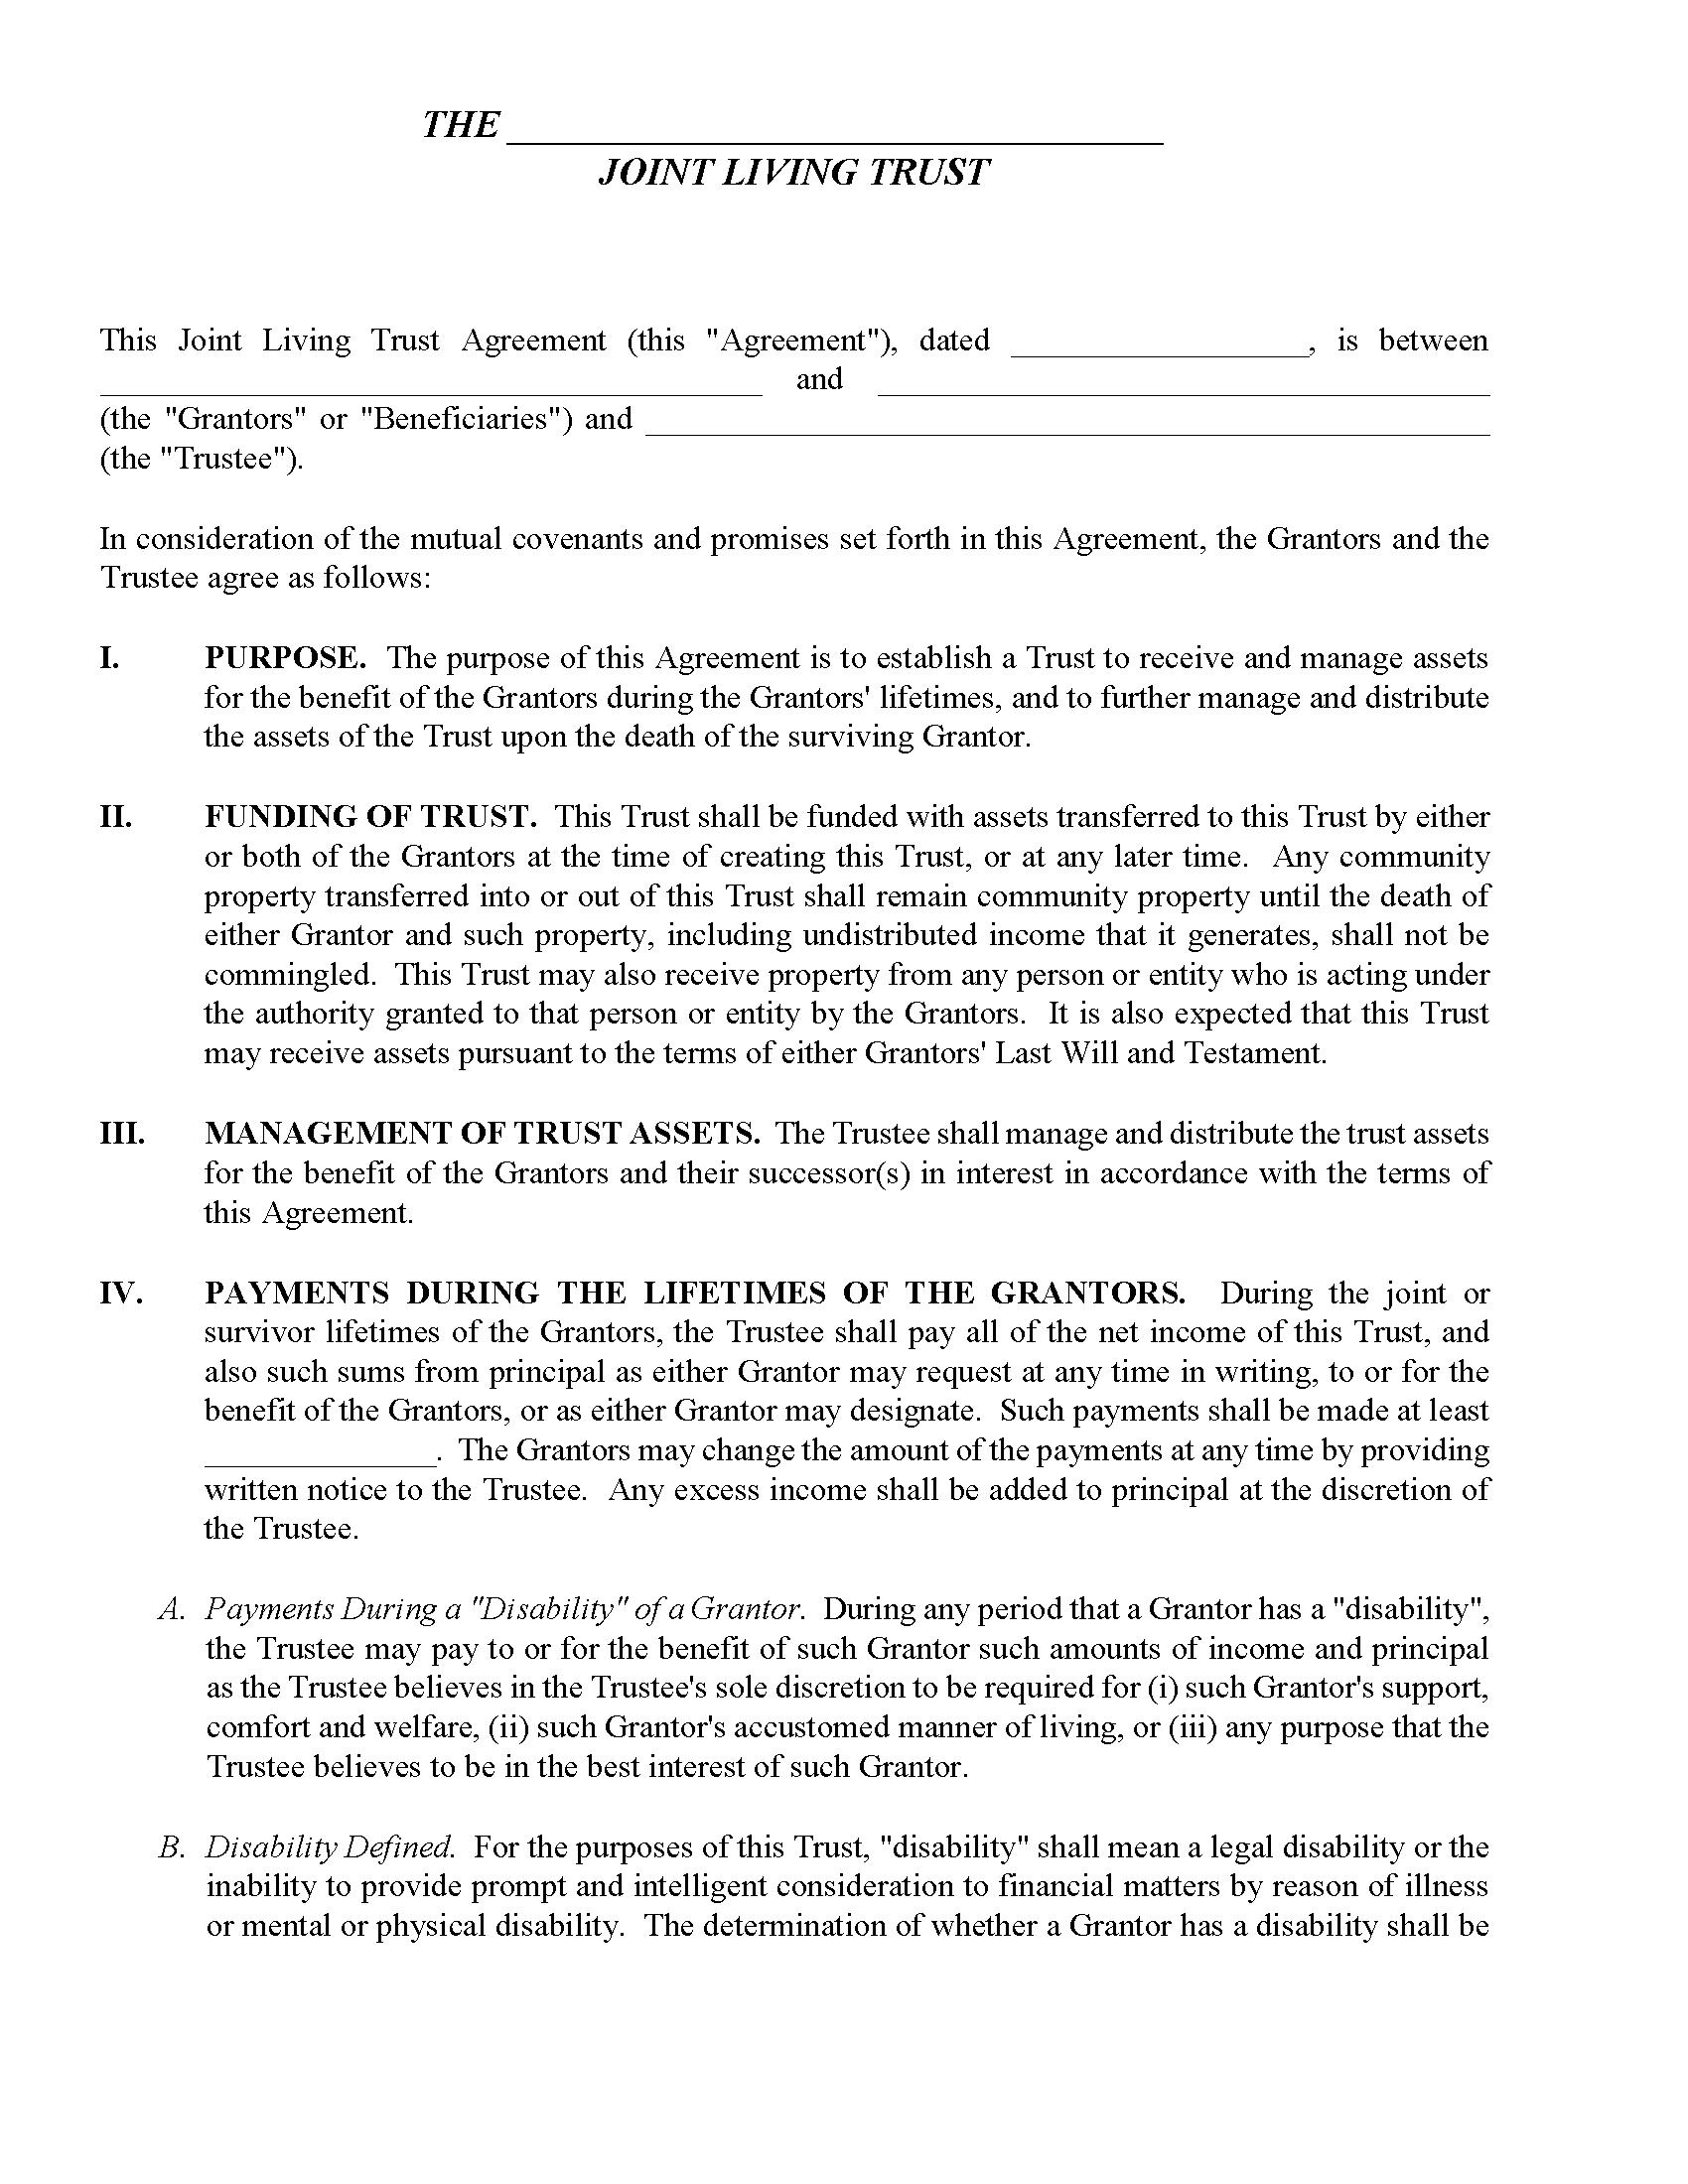 Mississippi Joint Living Trust Form